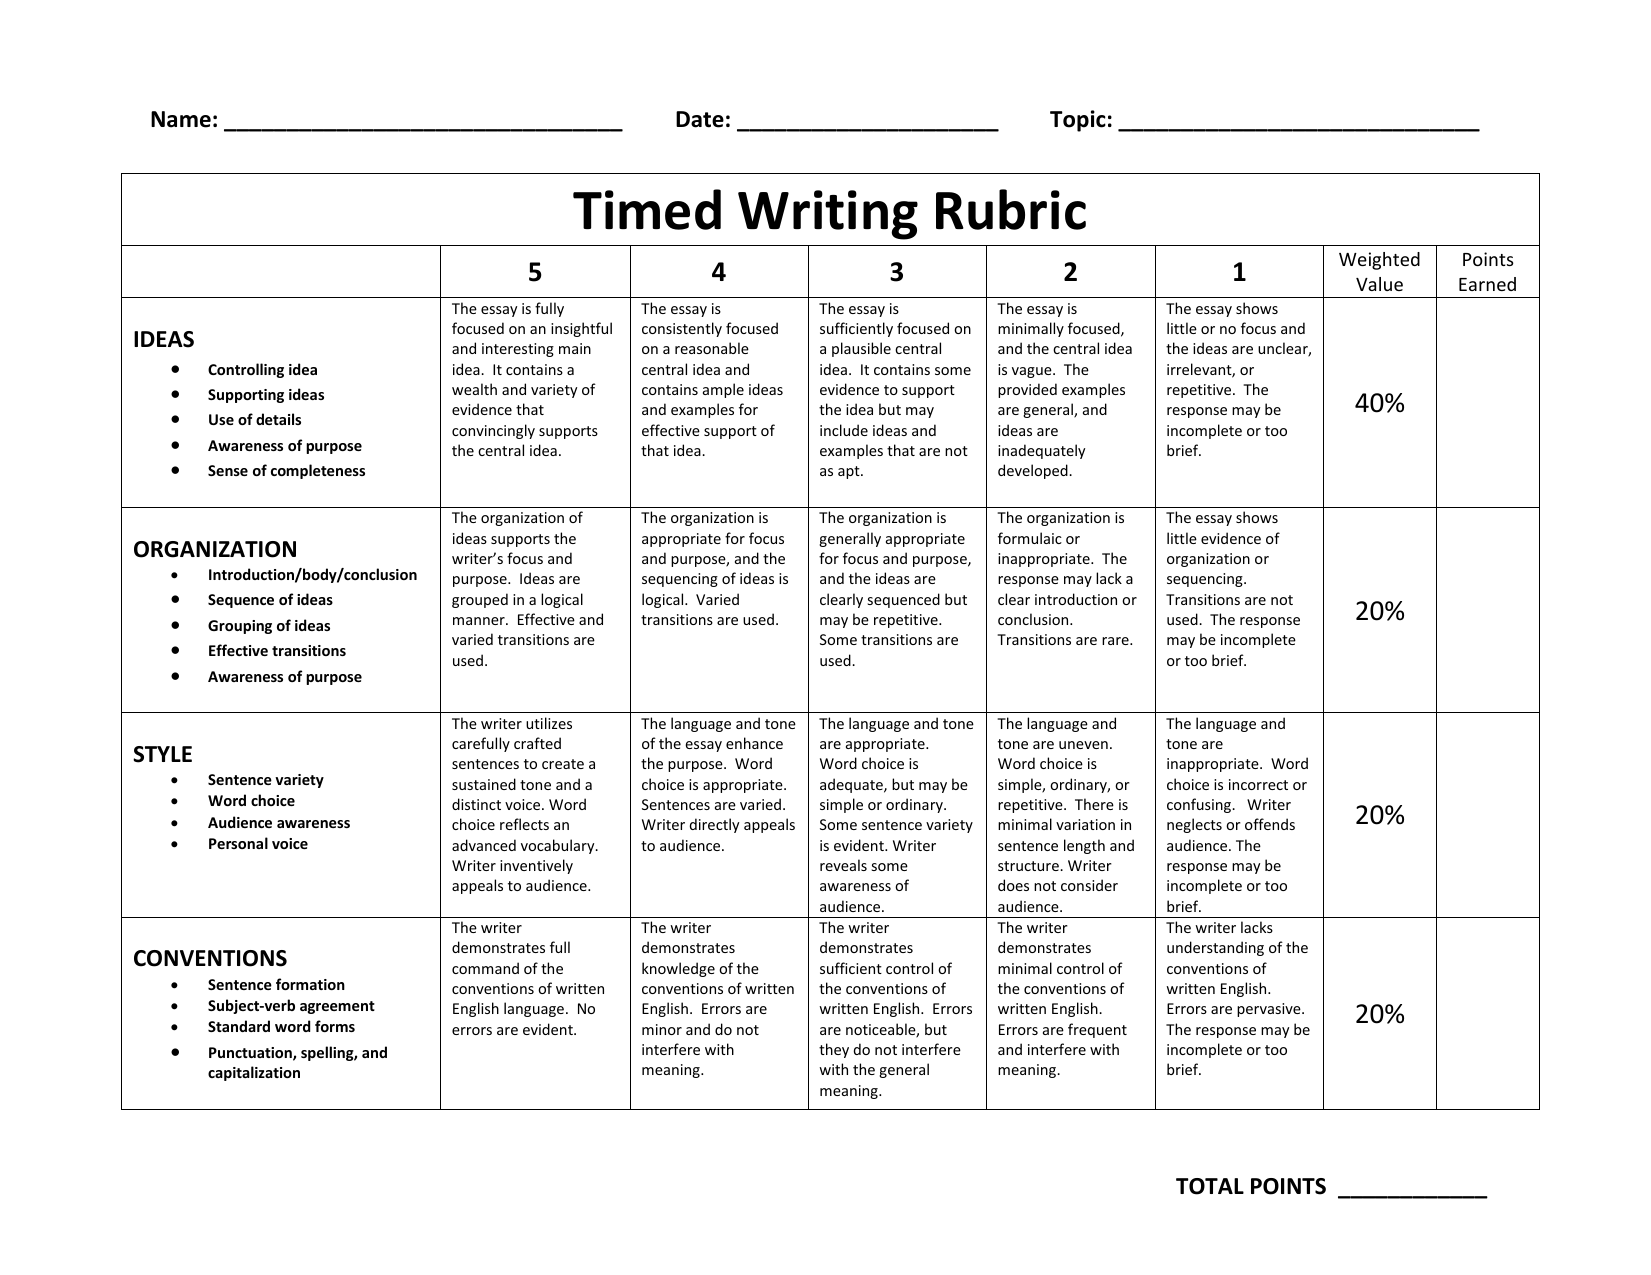 in class timed essay rubric